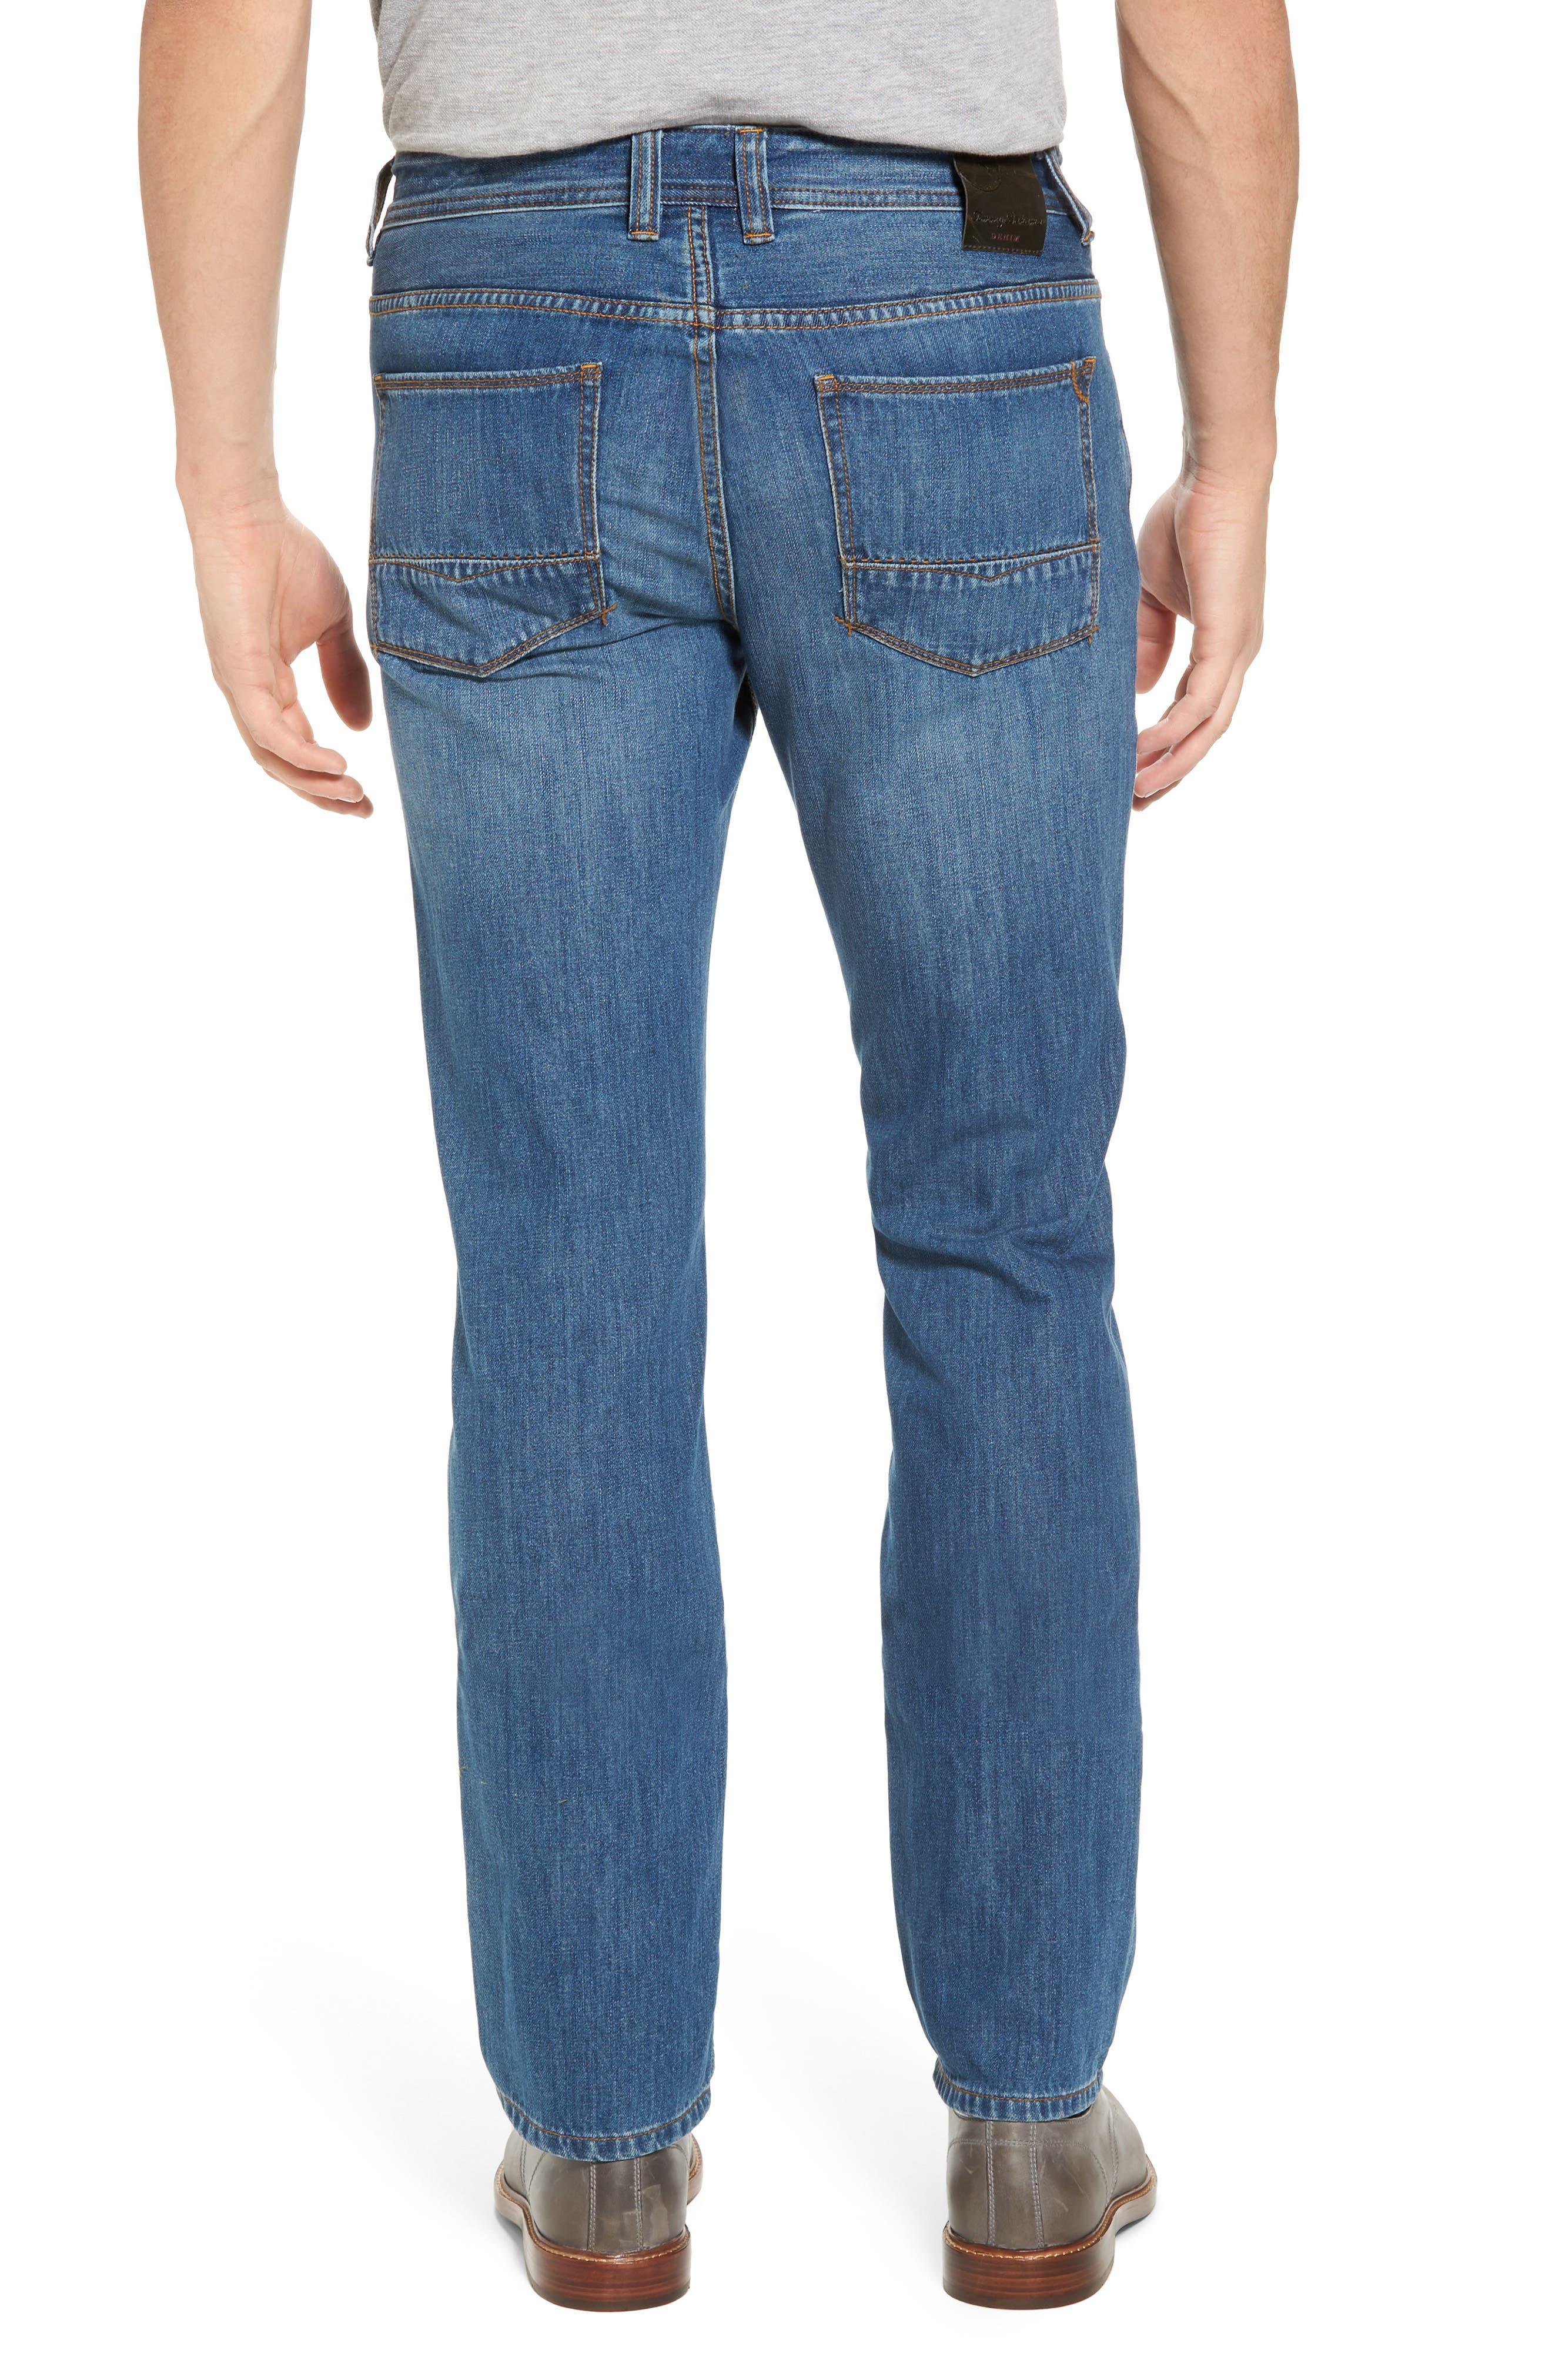 Bardabos Straight Leg Jeans,                             Alternate thumbnail 3, color,                             400